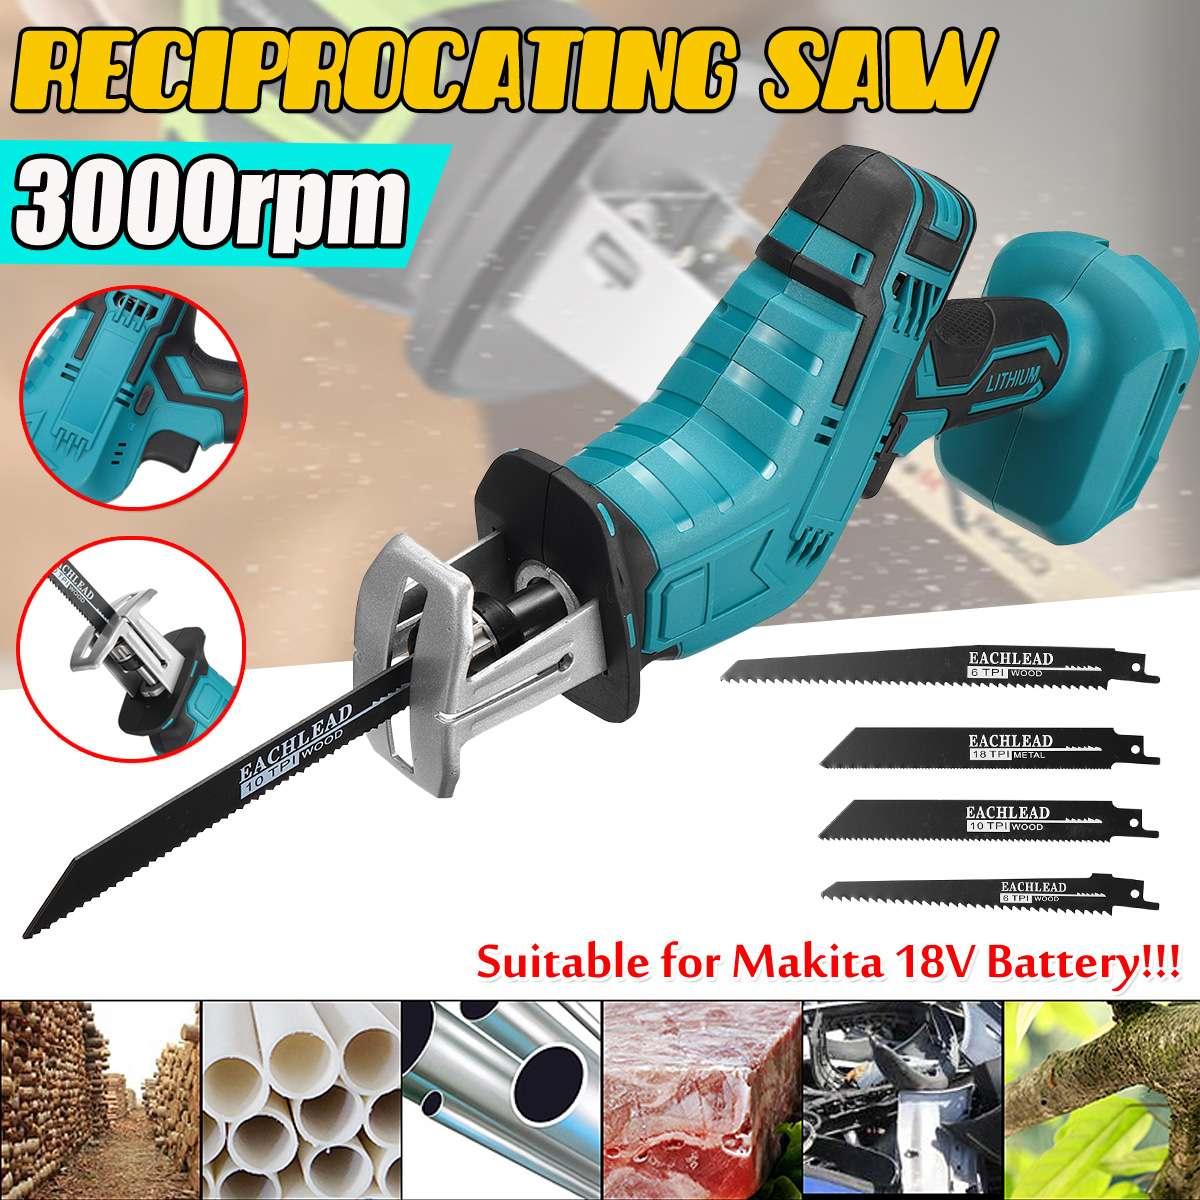 18v Saber Saw Lithium Battery Brushless Reciprocating Bare Metal